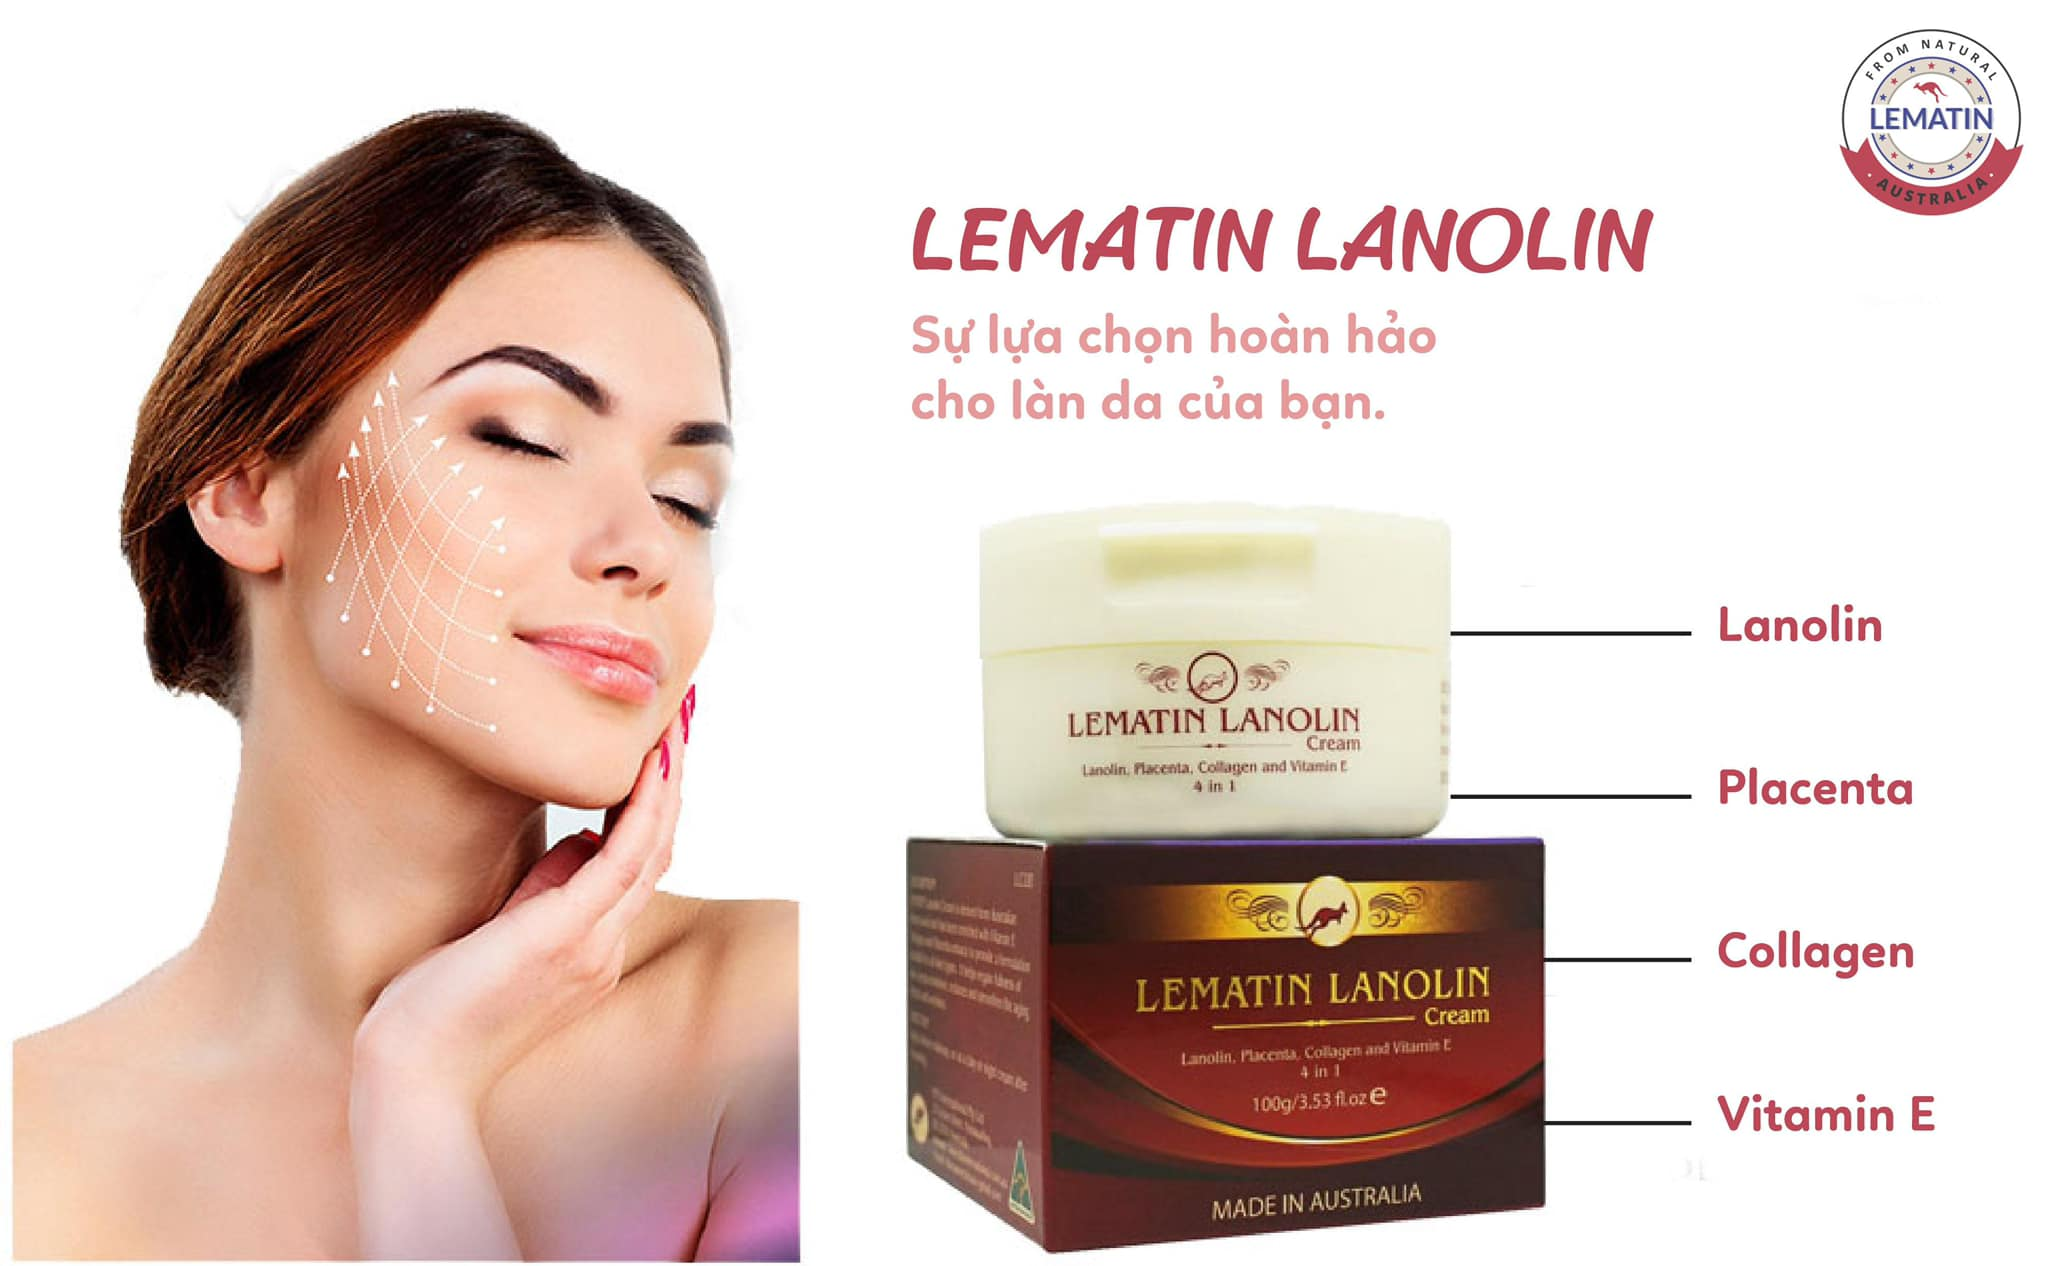 LEMATIN-LANOLIN  (100 mg)